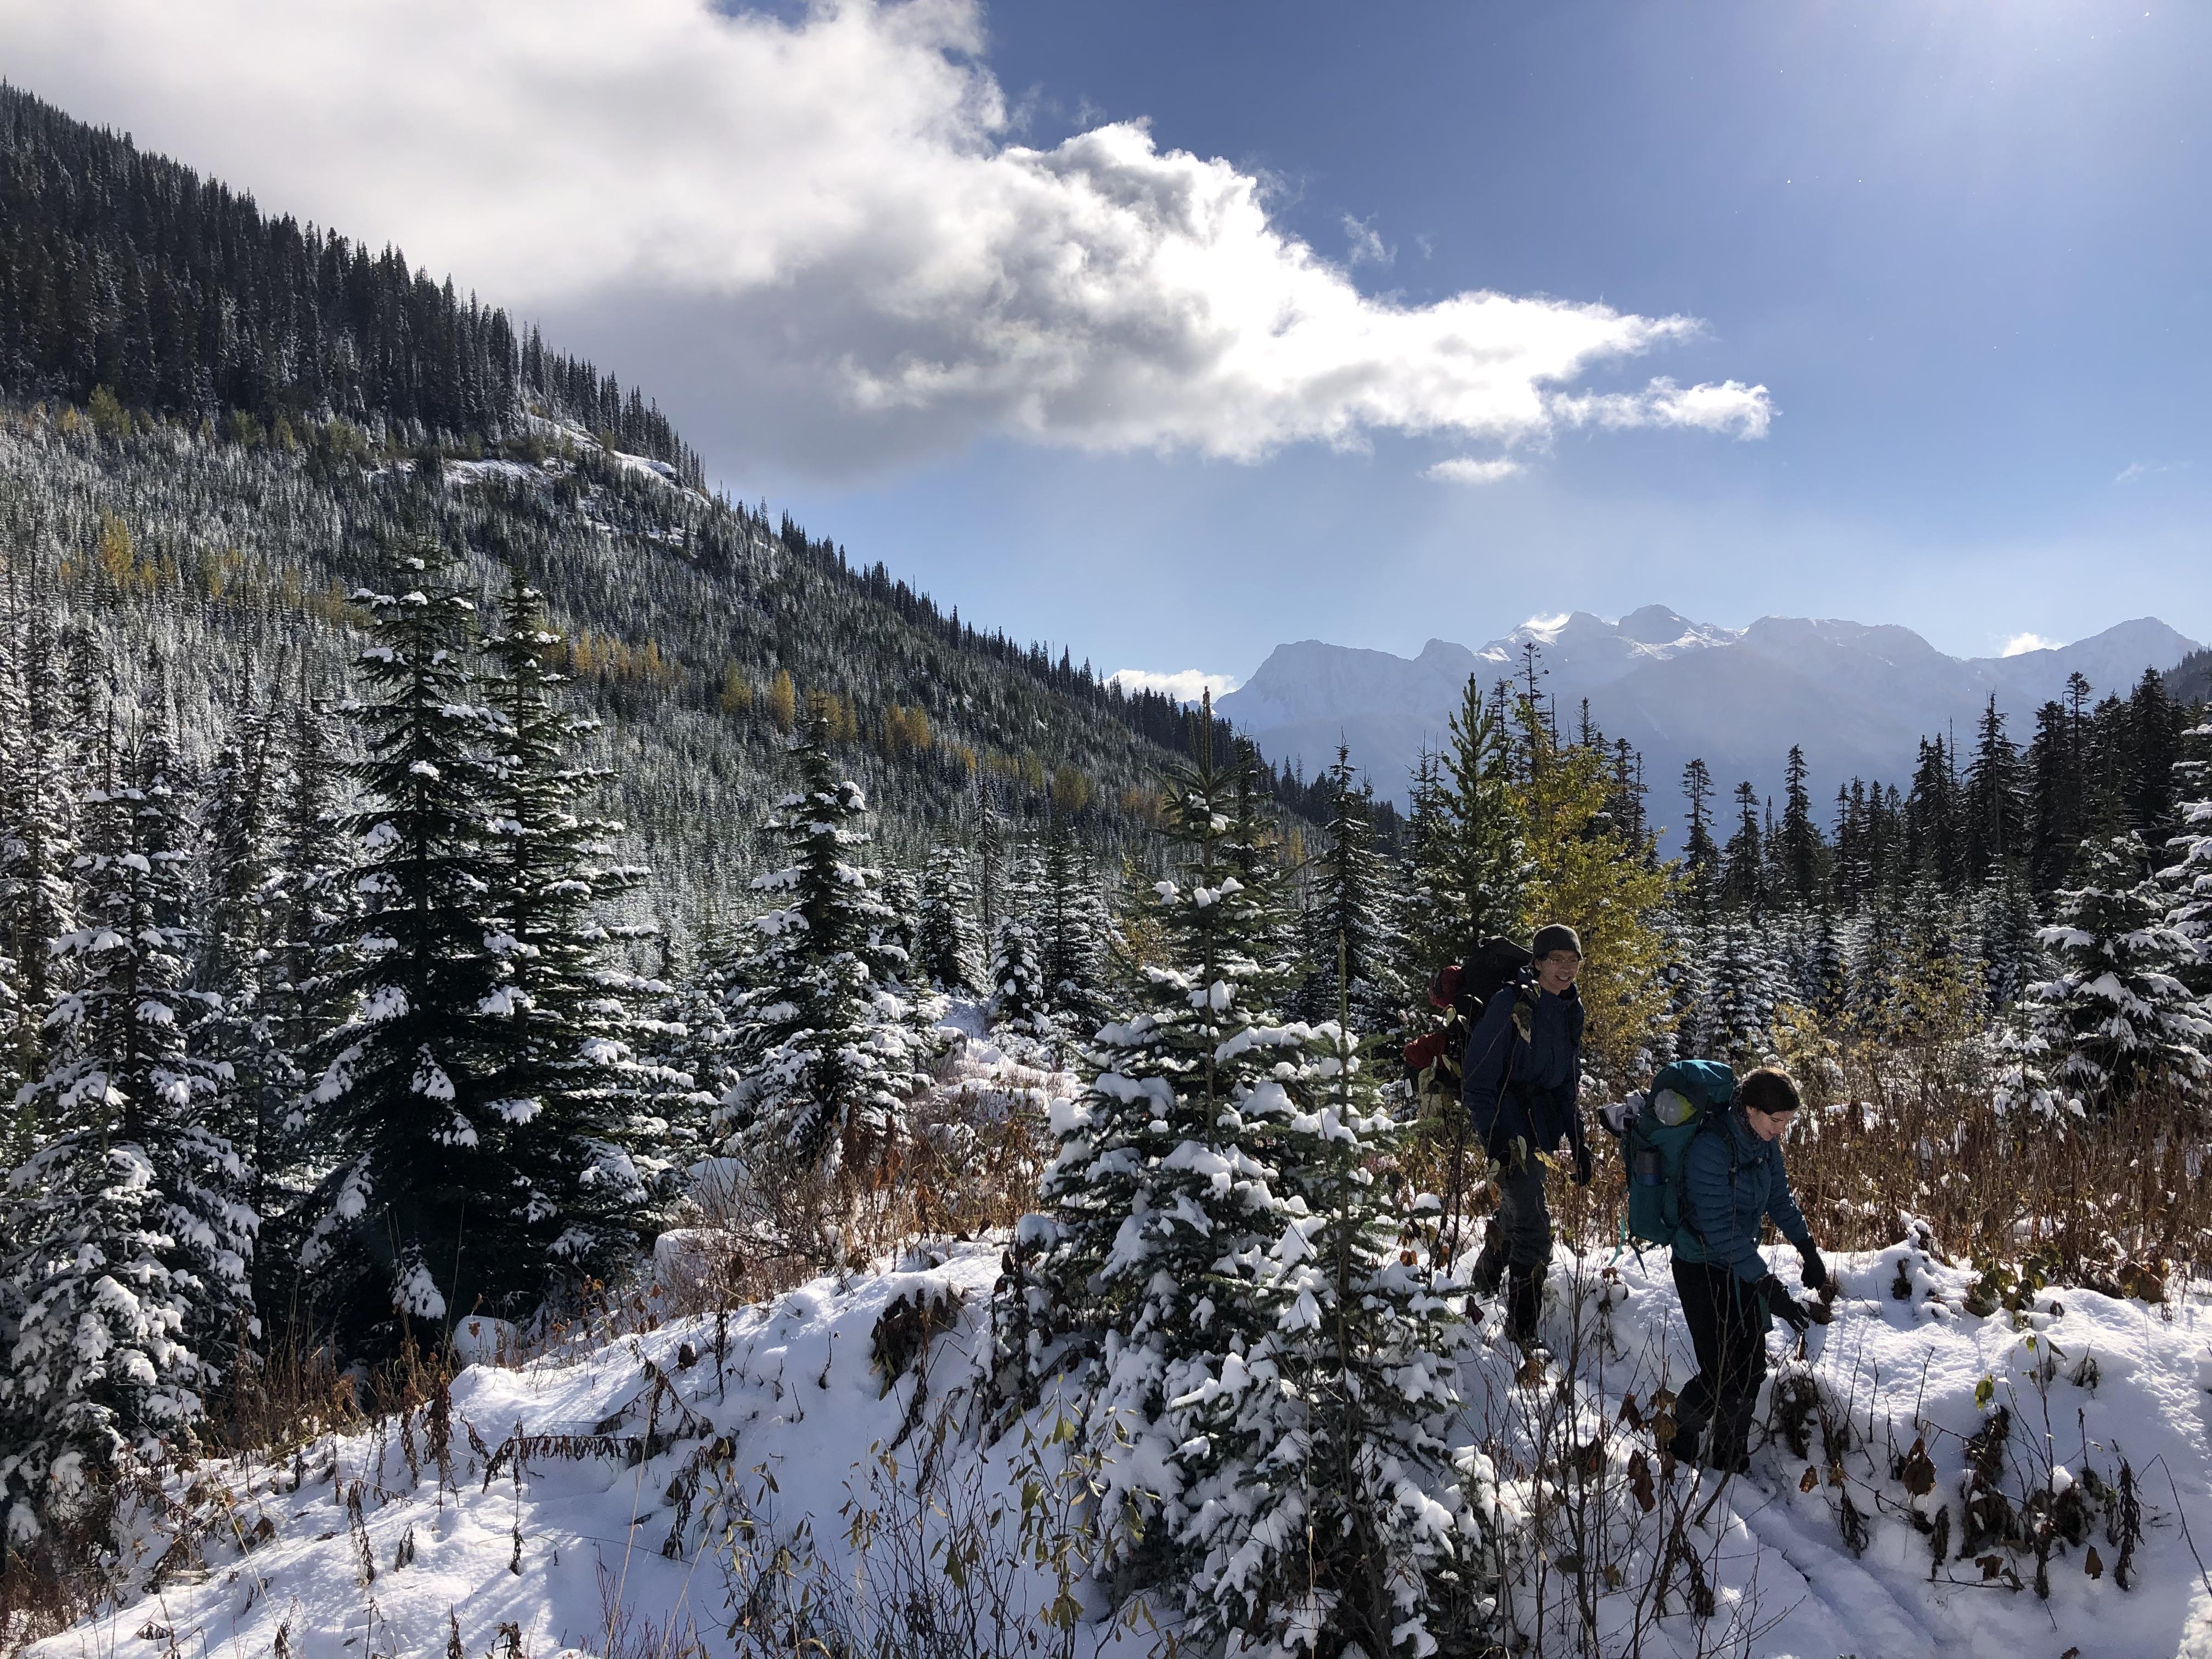 Slide alders and snow